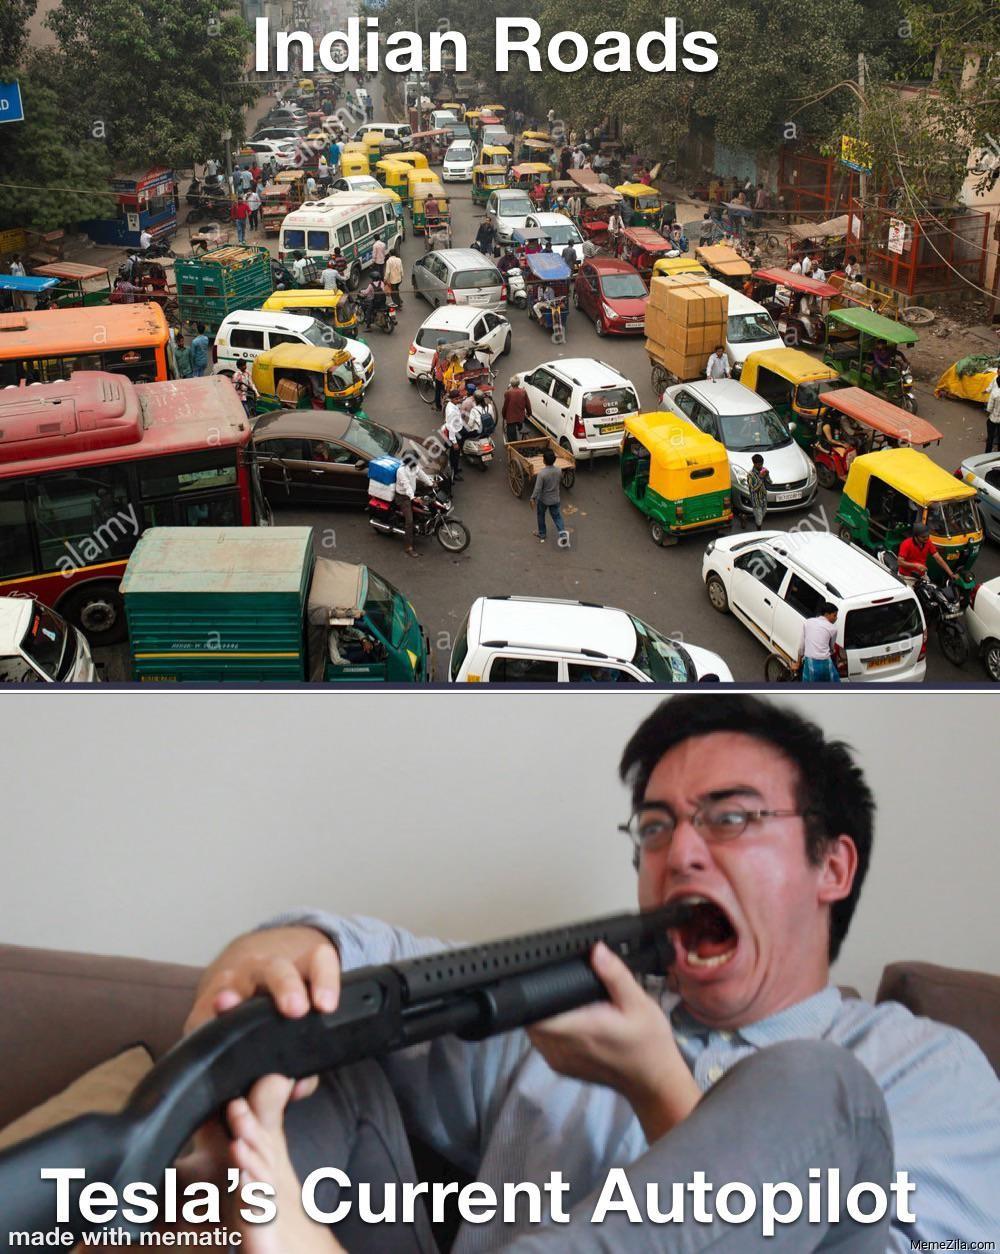 India Roads Meanwhile Tesla's current autopilot meme